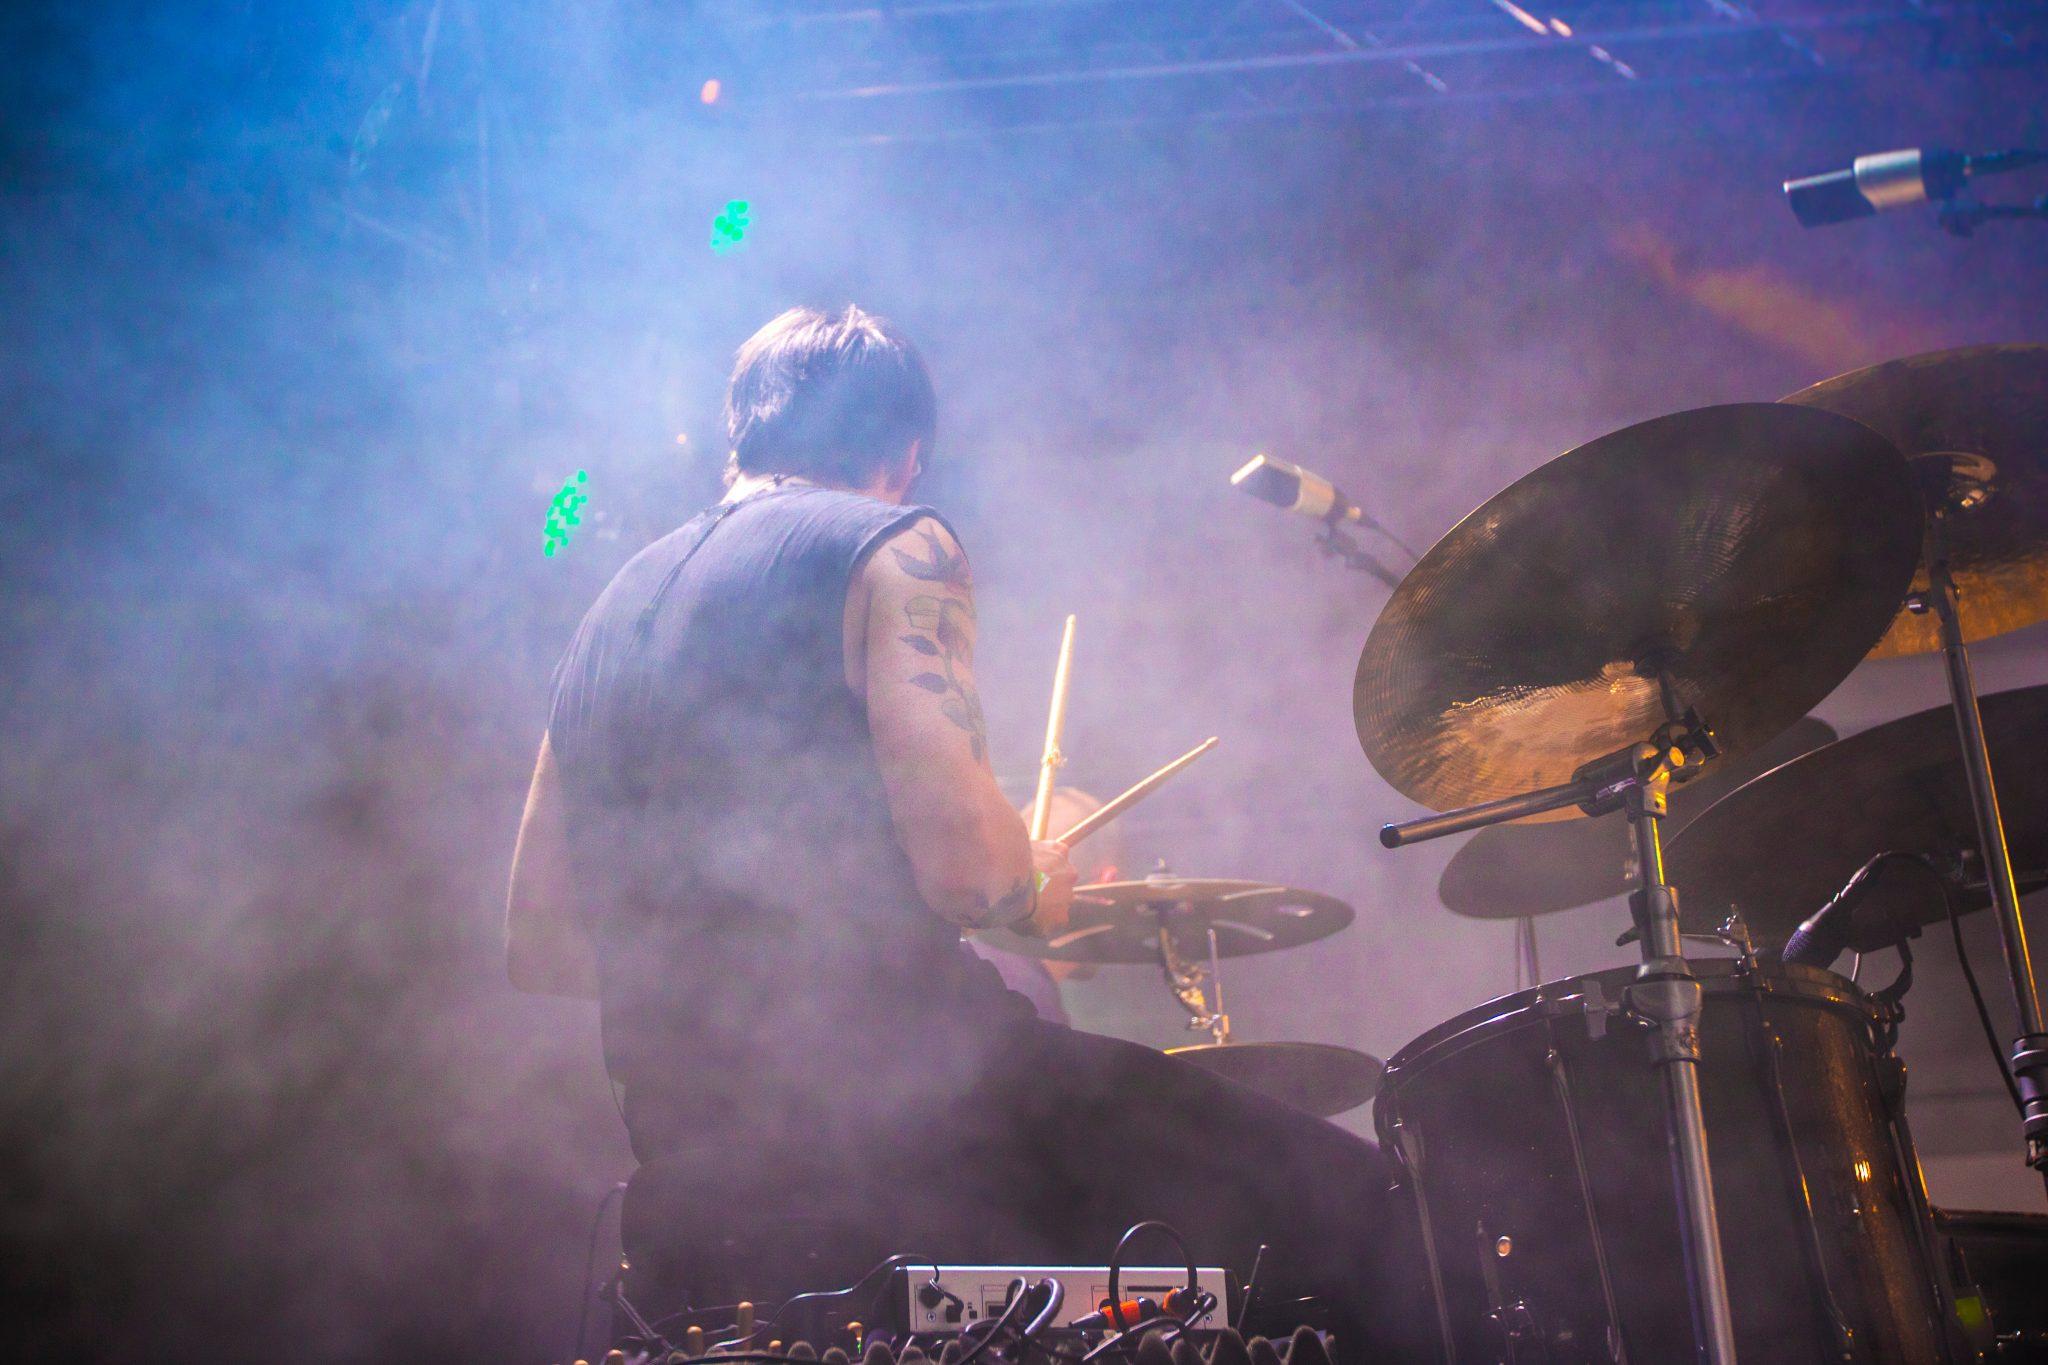 drummer performing at live concert